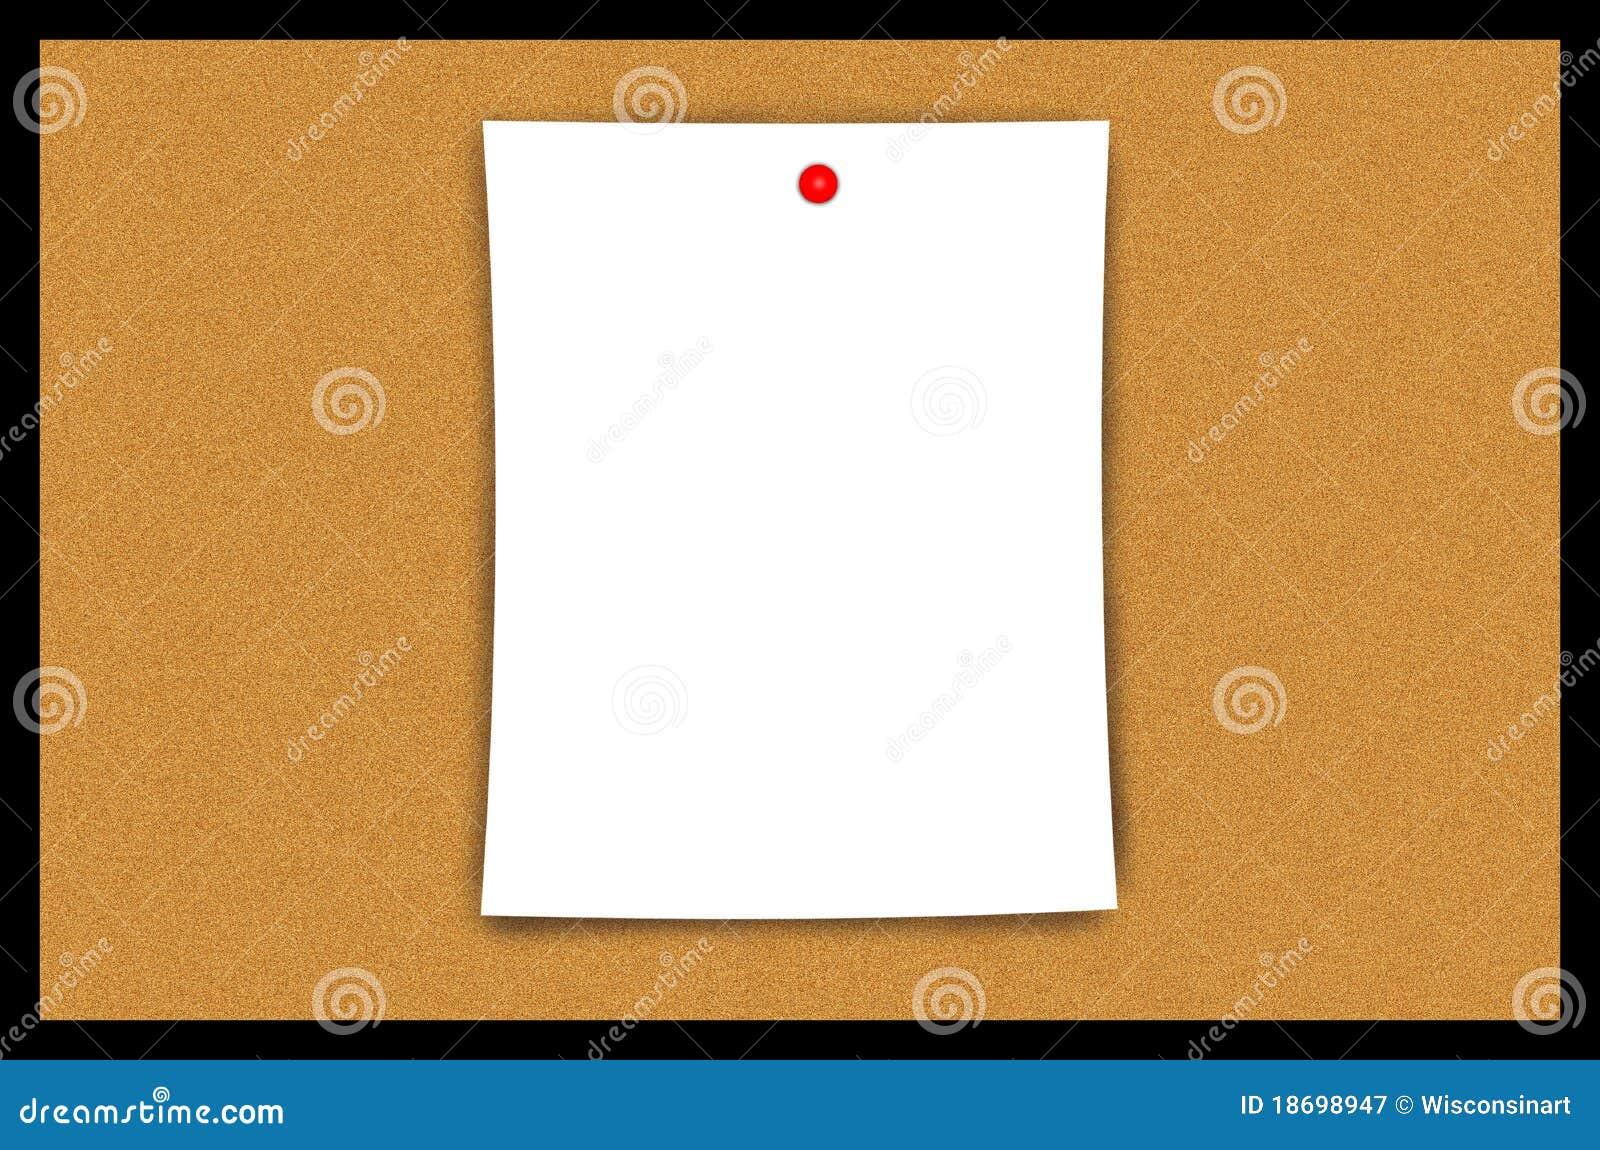 Cork Bulletin Board Blank Paper Sheet Illustration Royalty Free Stock Photography Image 18698947